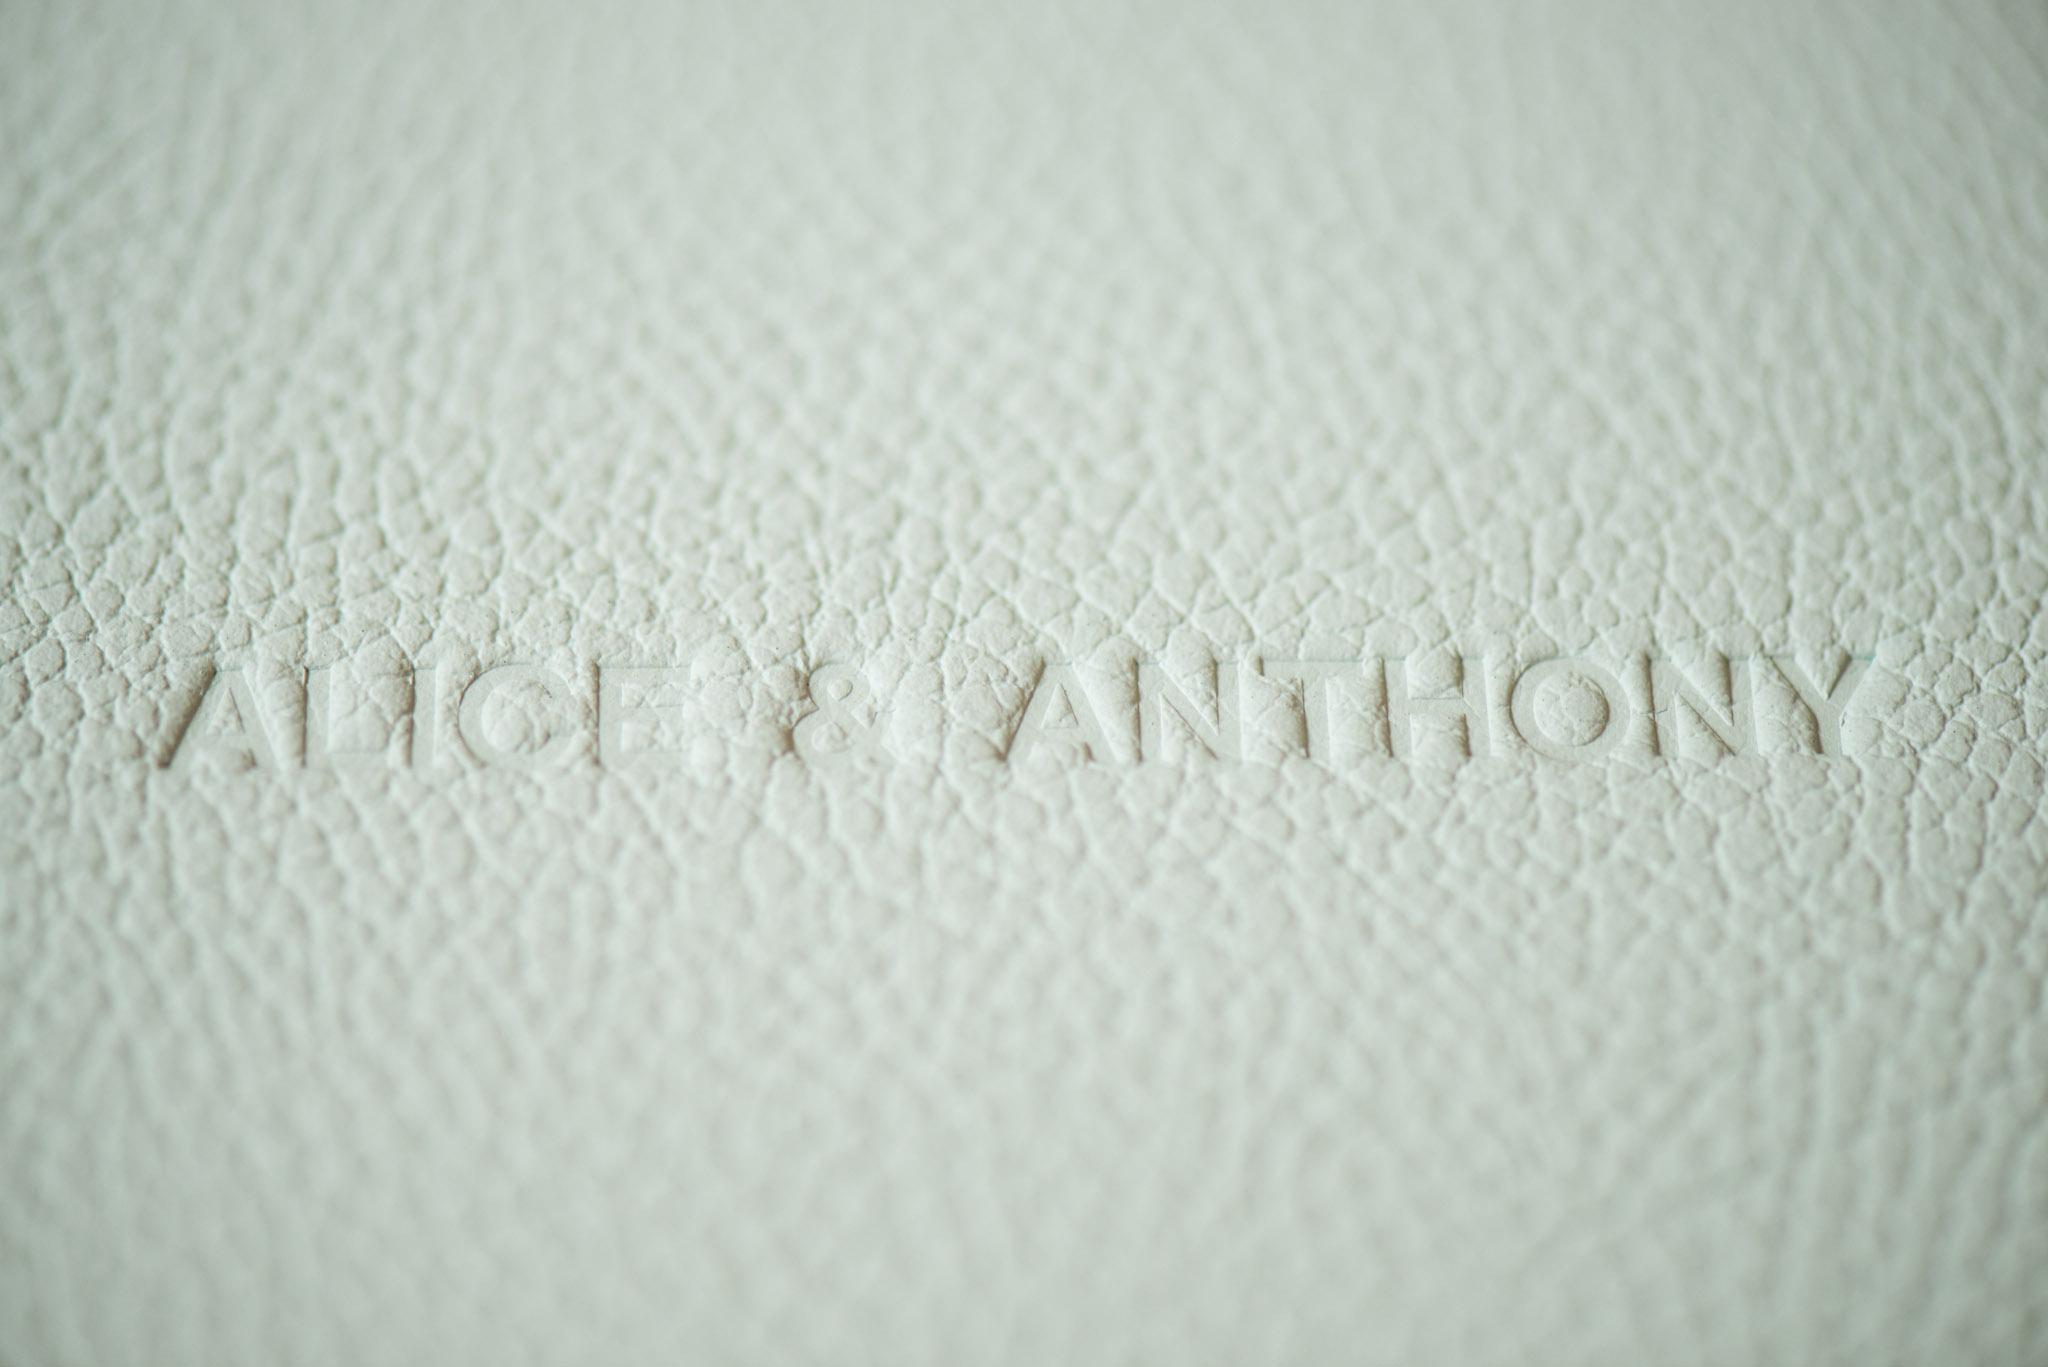 Ebossed names on fine art leather album